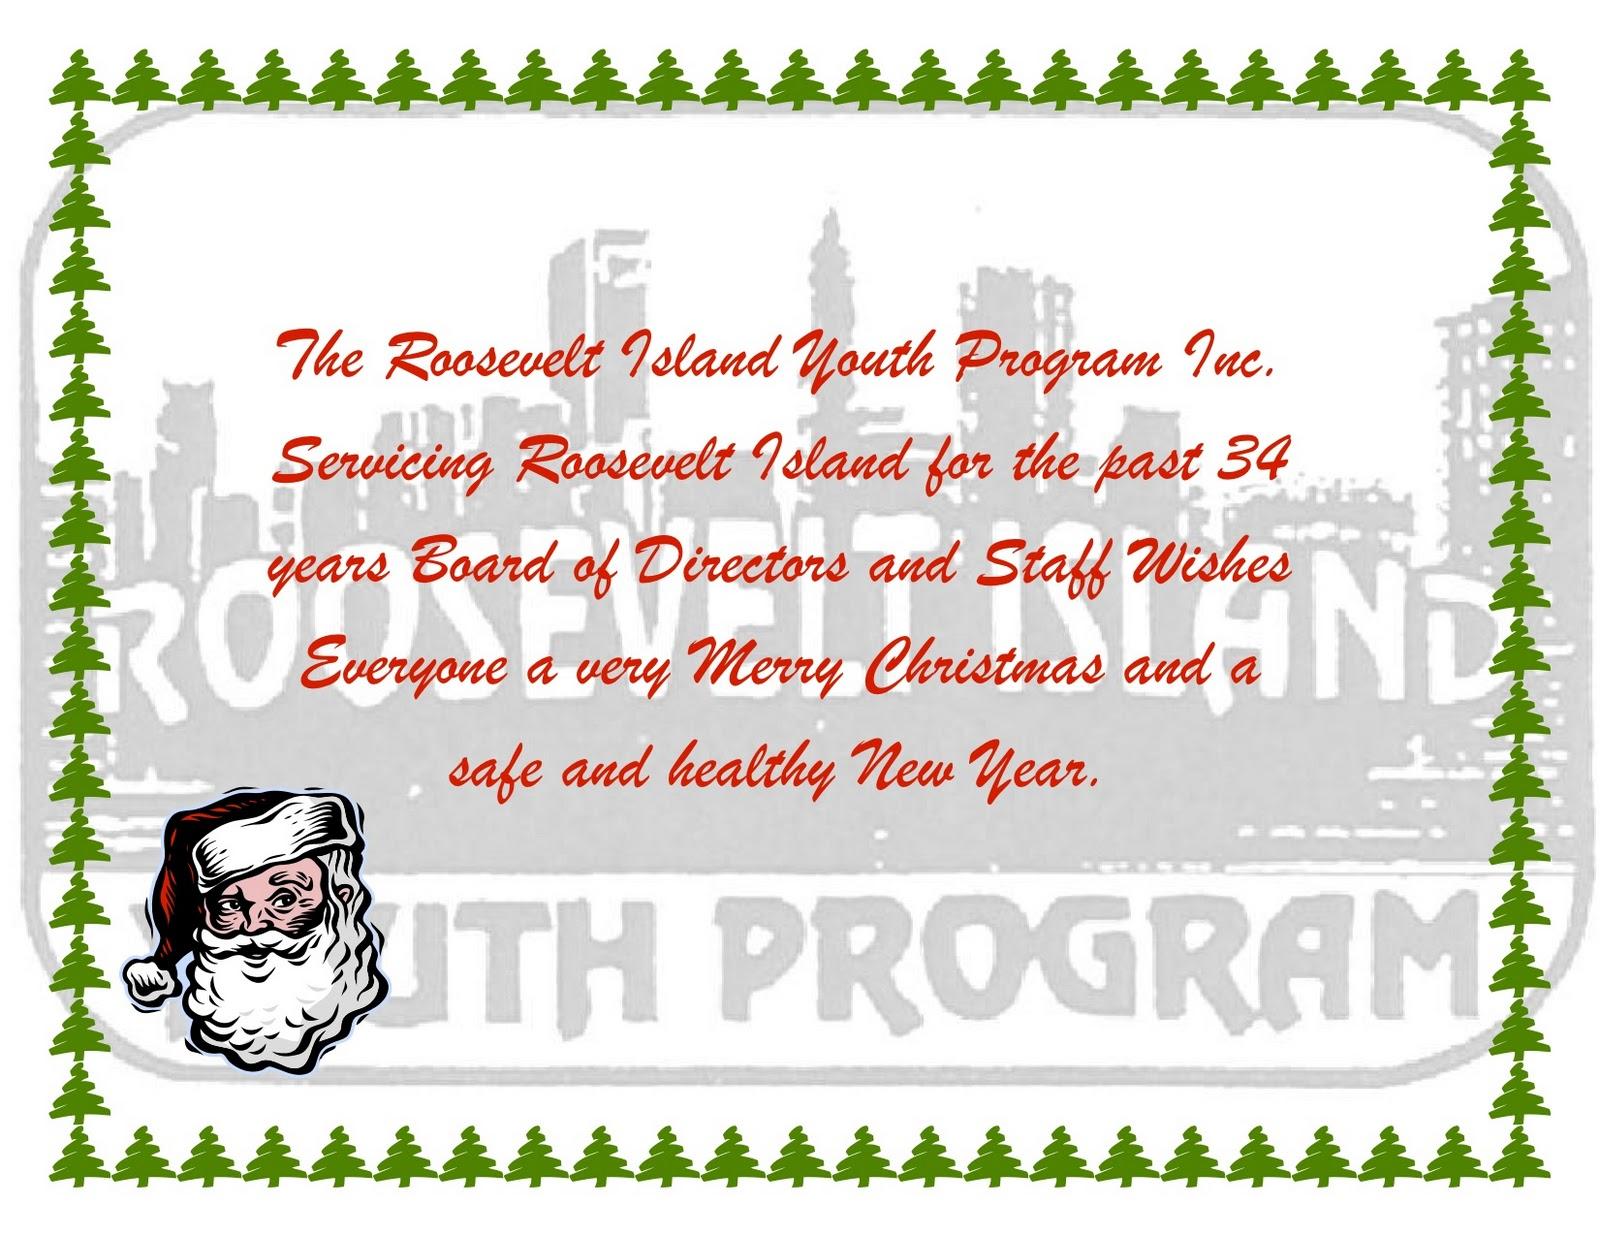 Roosevelt Islander Online 121811 122511